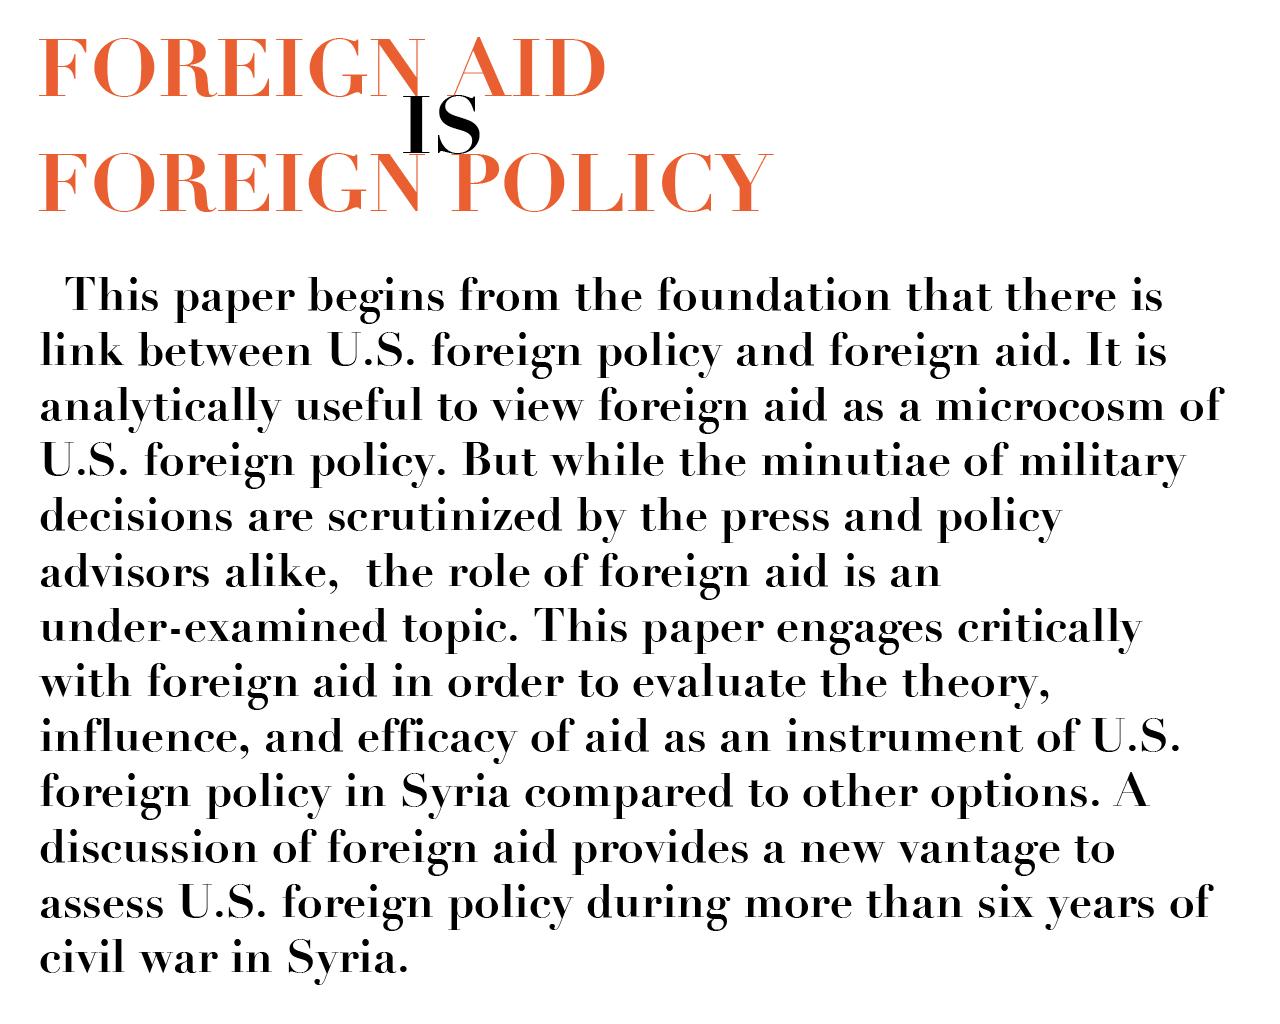 Gitan_ThesisProposalPresnetatio_Website_ForeignAidForeignPolicy-100.jpg